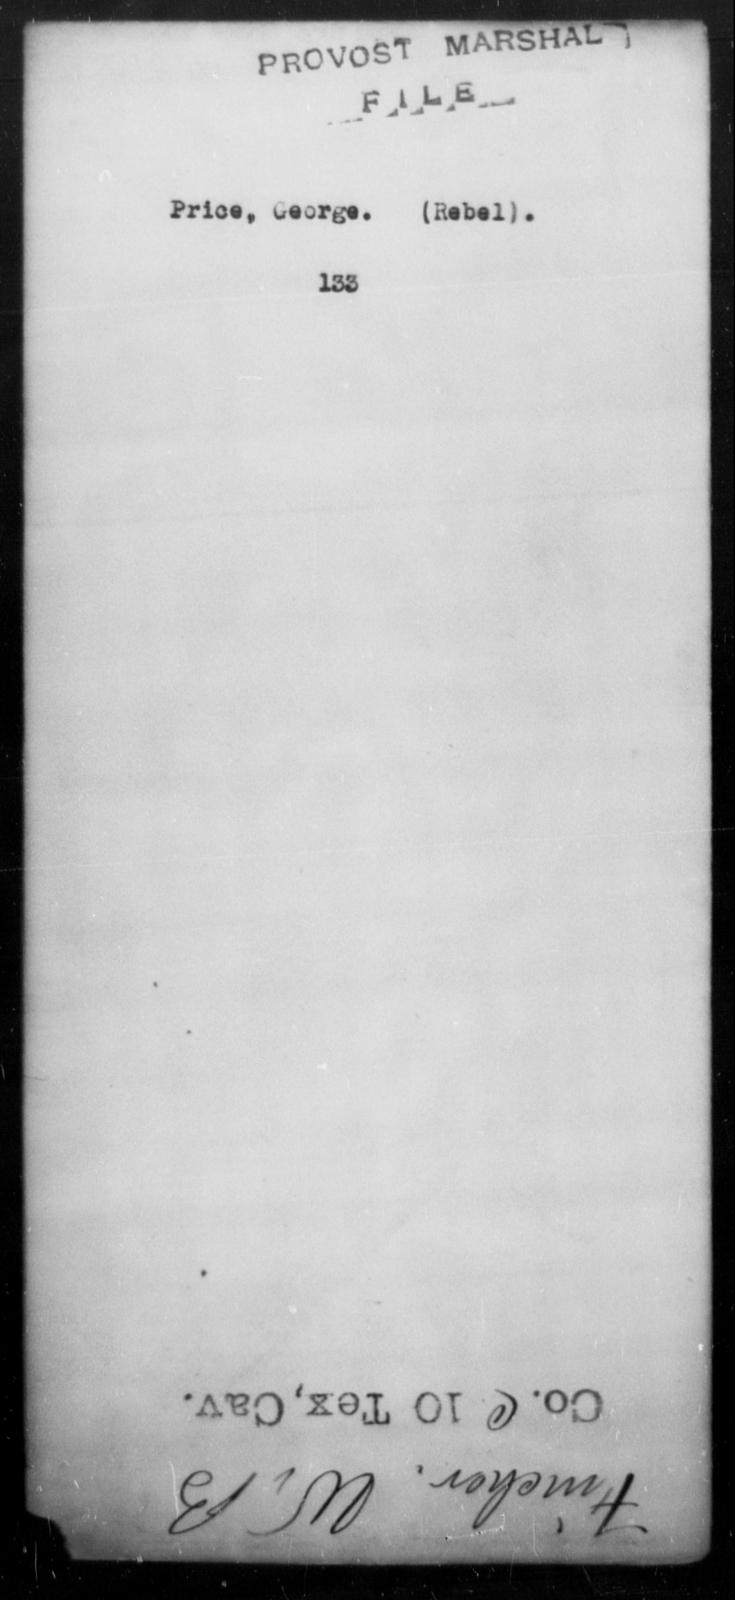 Price, George - State: [Blank] - Year: [Blank]